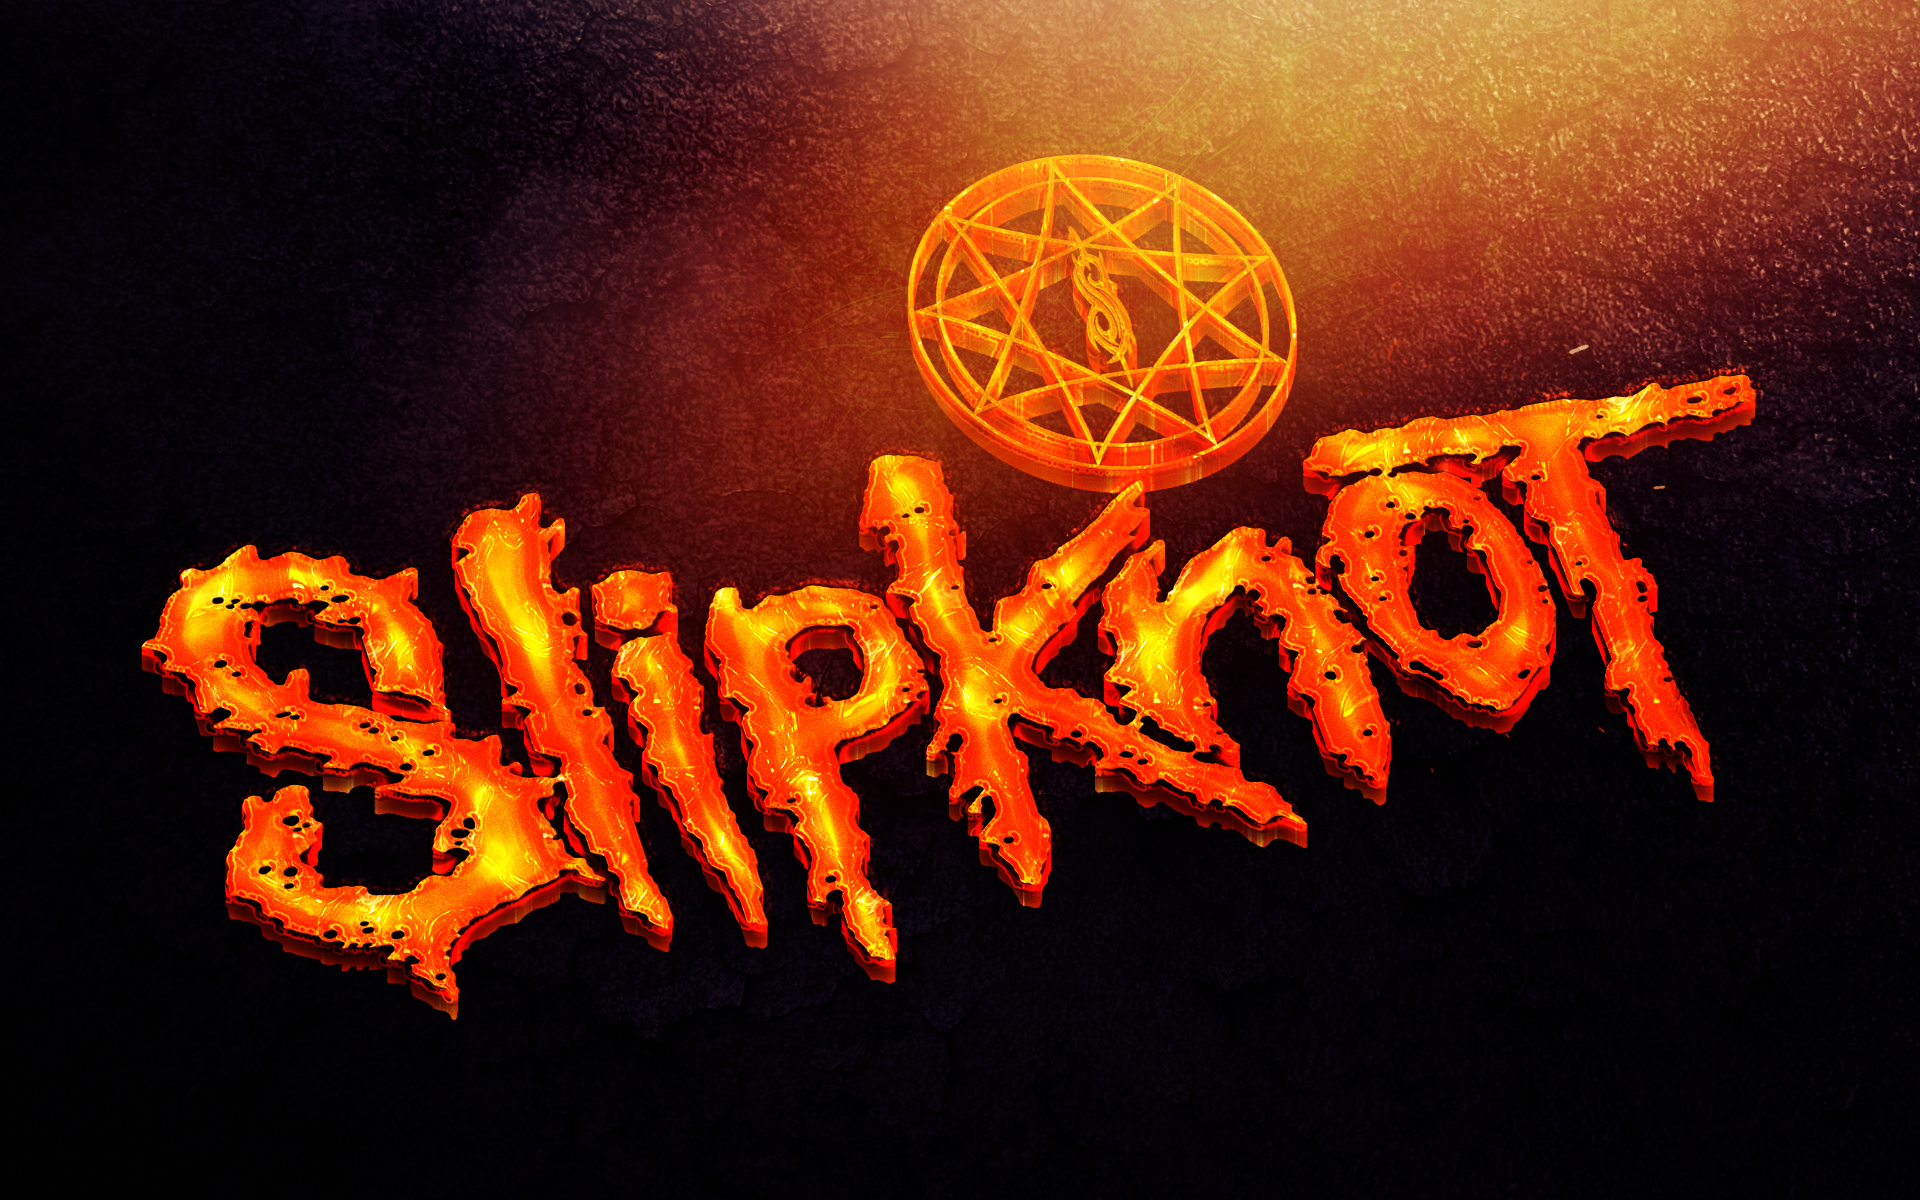 Slipknot logo by croatian crusader 1920x1200